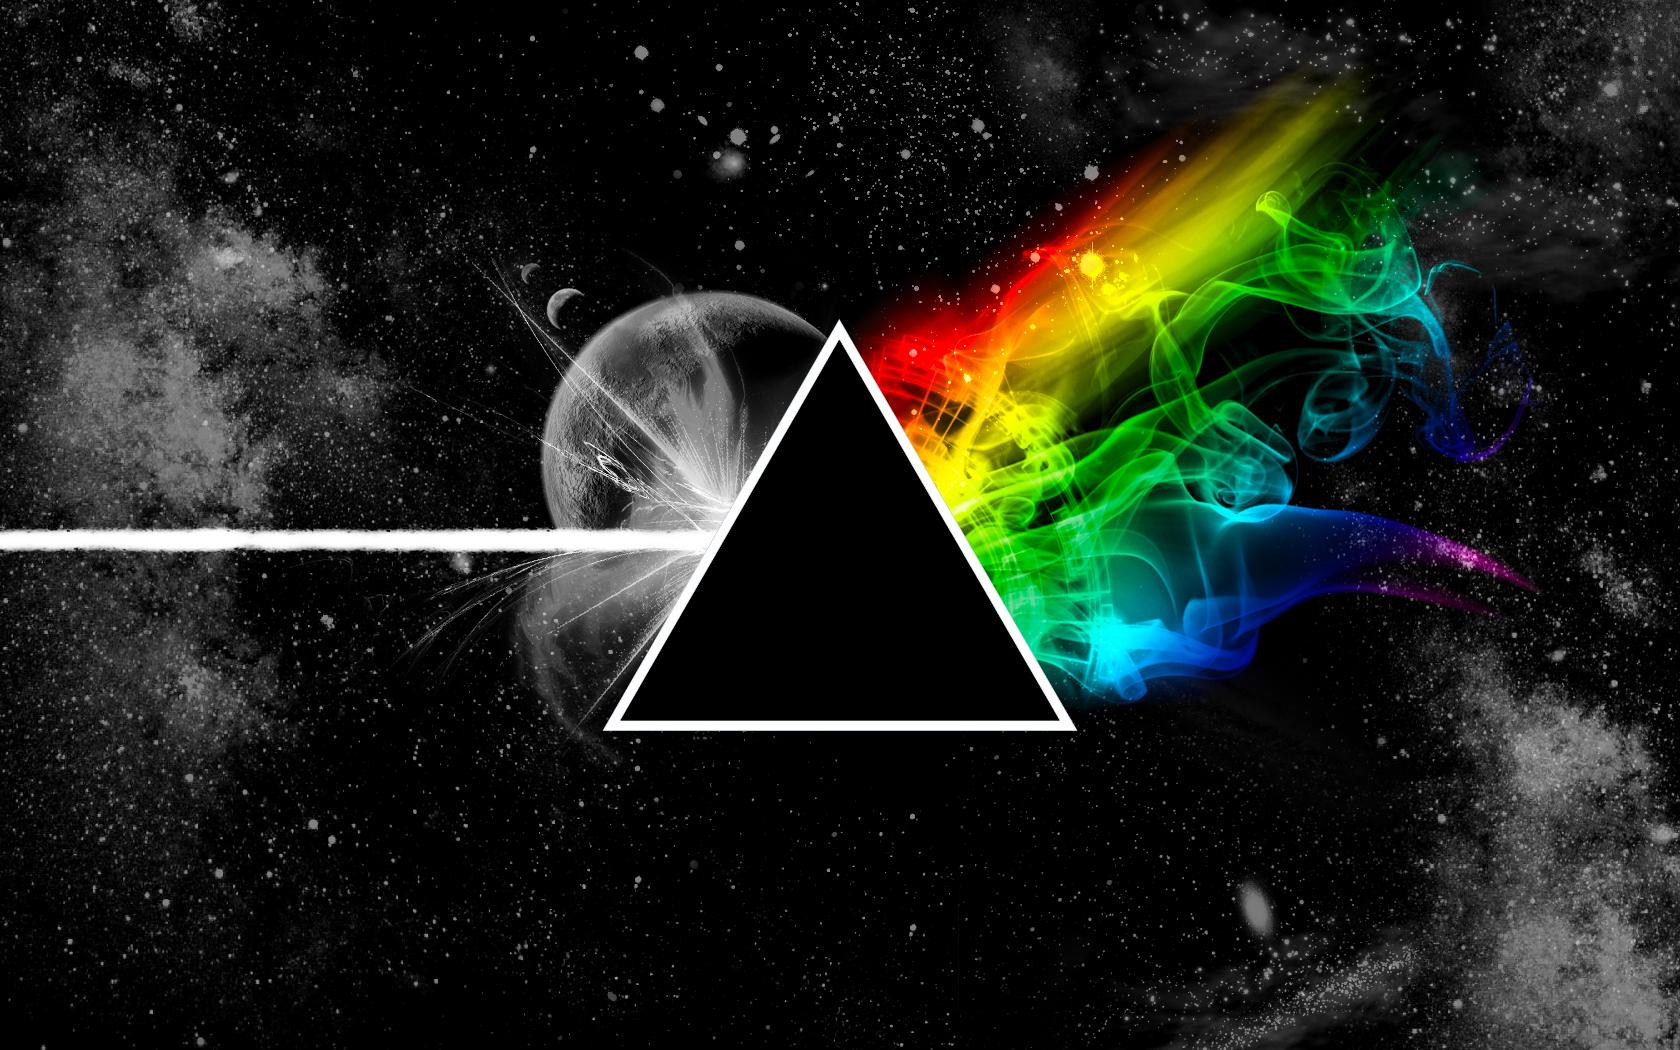 Pink Floyd Wallpapers y fotos buena calidad   Taringa 1680x1050